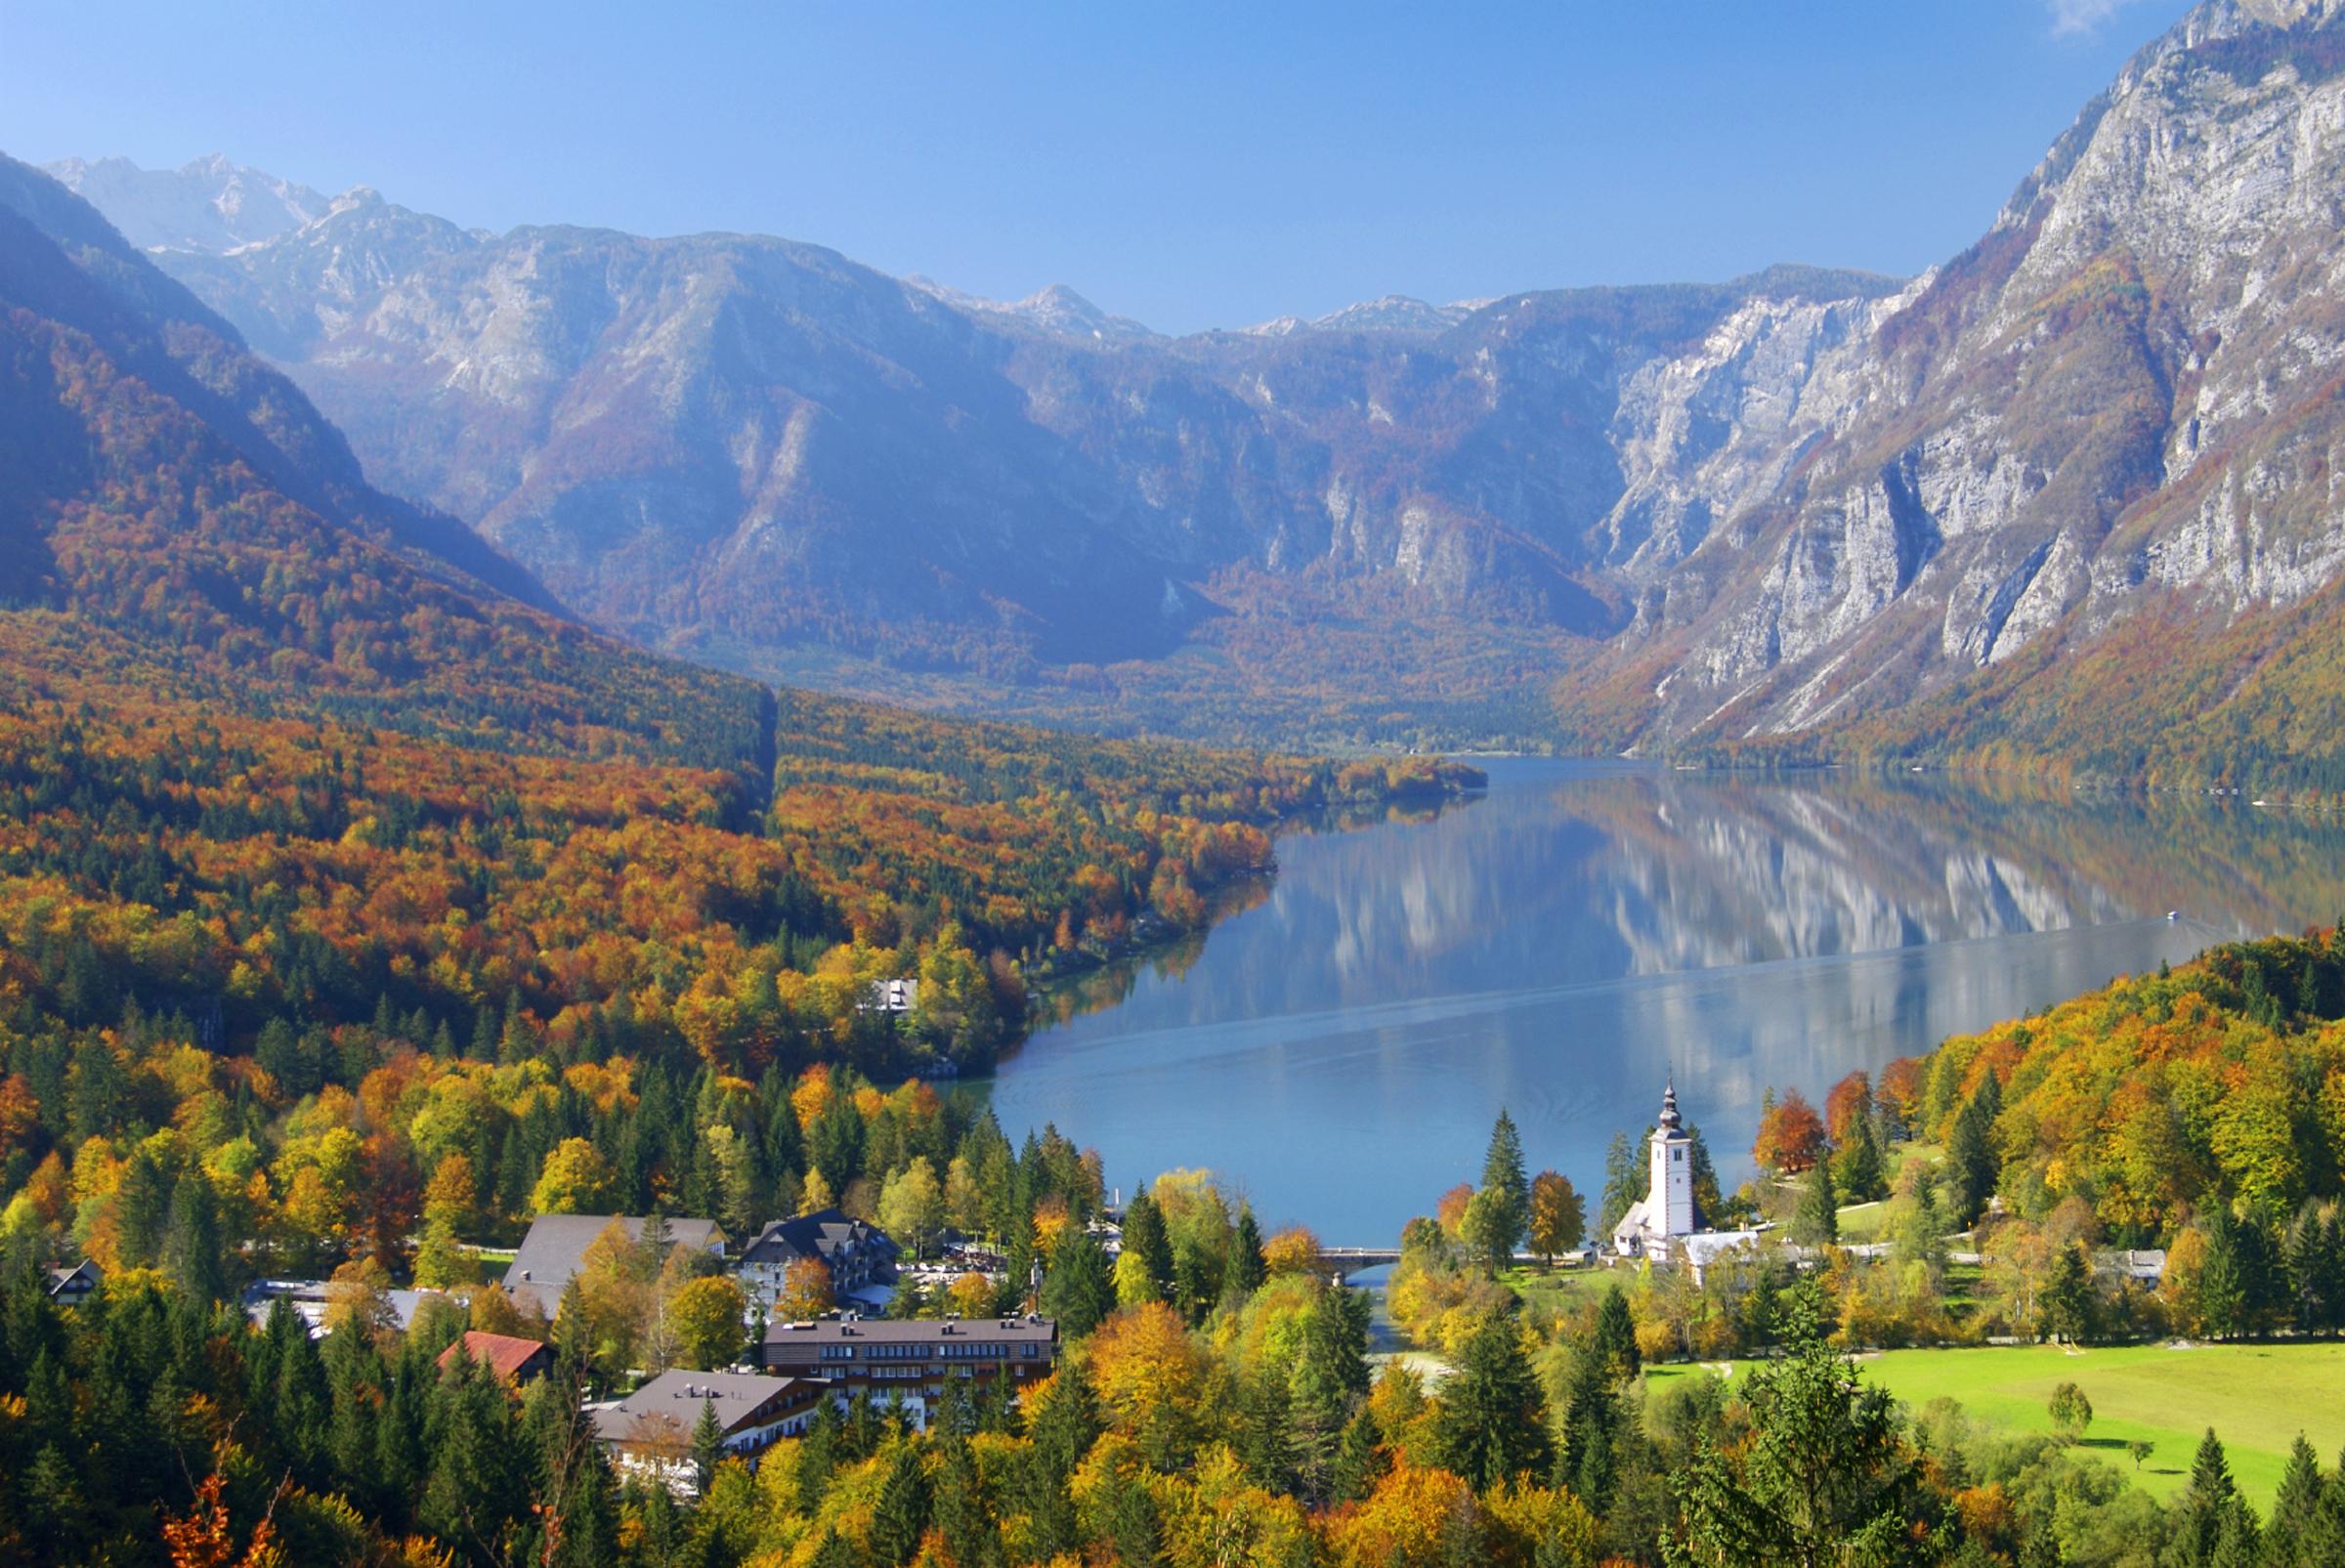 http://www.adventurewomen.com/wp-content/uploads/2015/09/WP-Lake-Bohinj-in-Autumn.jpg